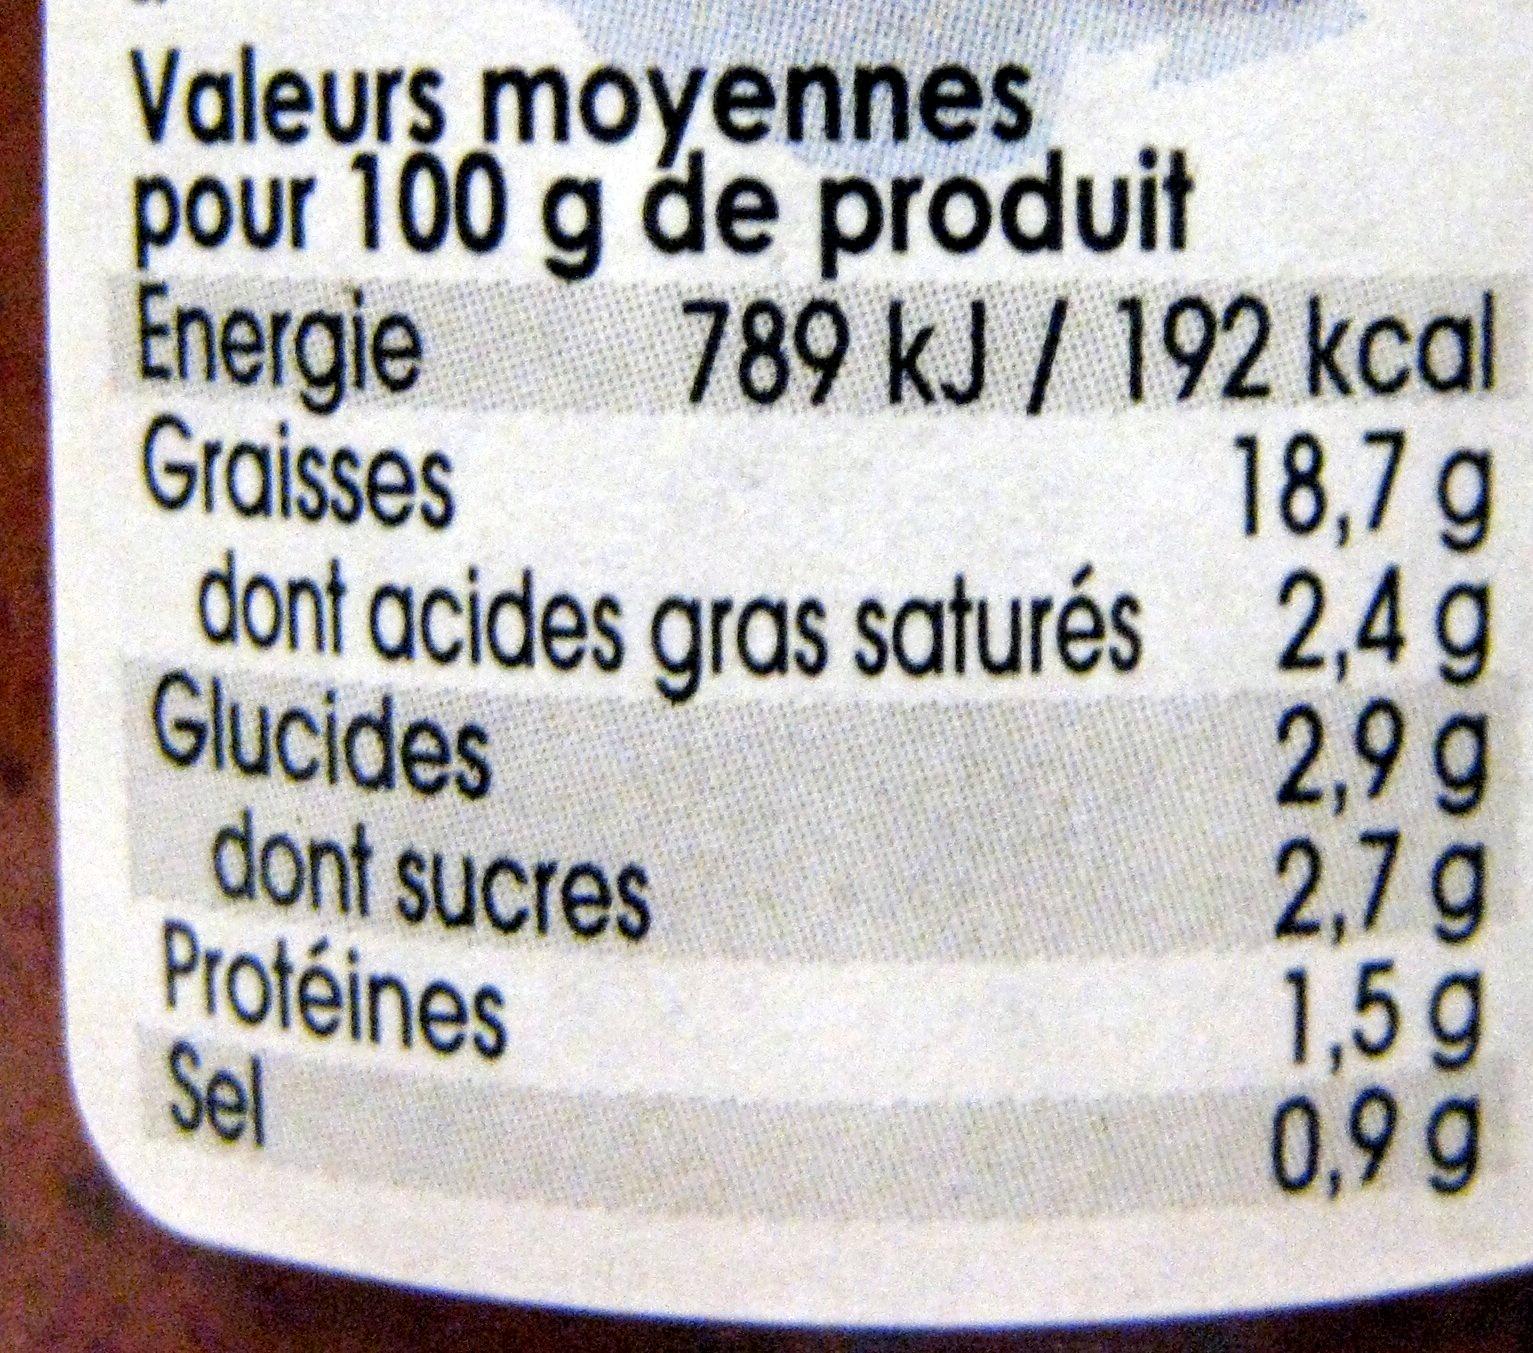 Sauce aux olives et tomates Sacla - Voedingswaarden